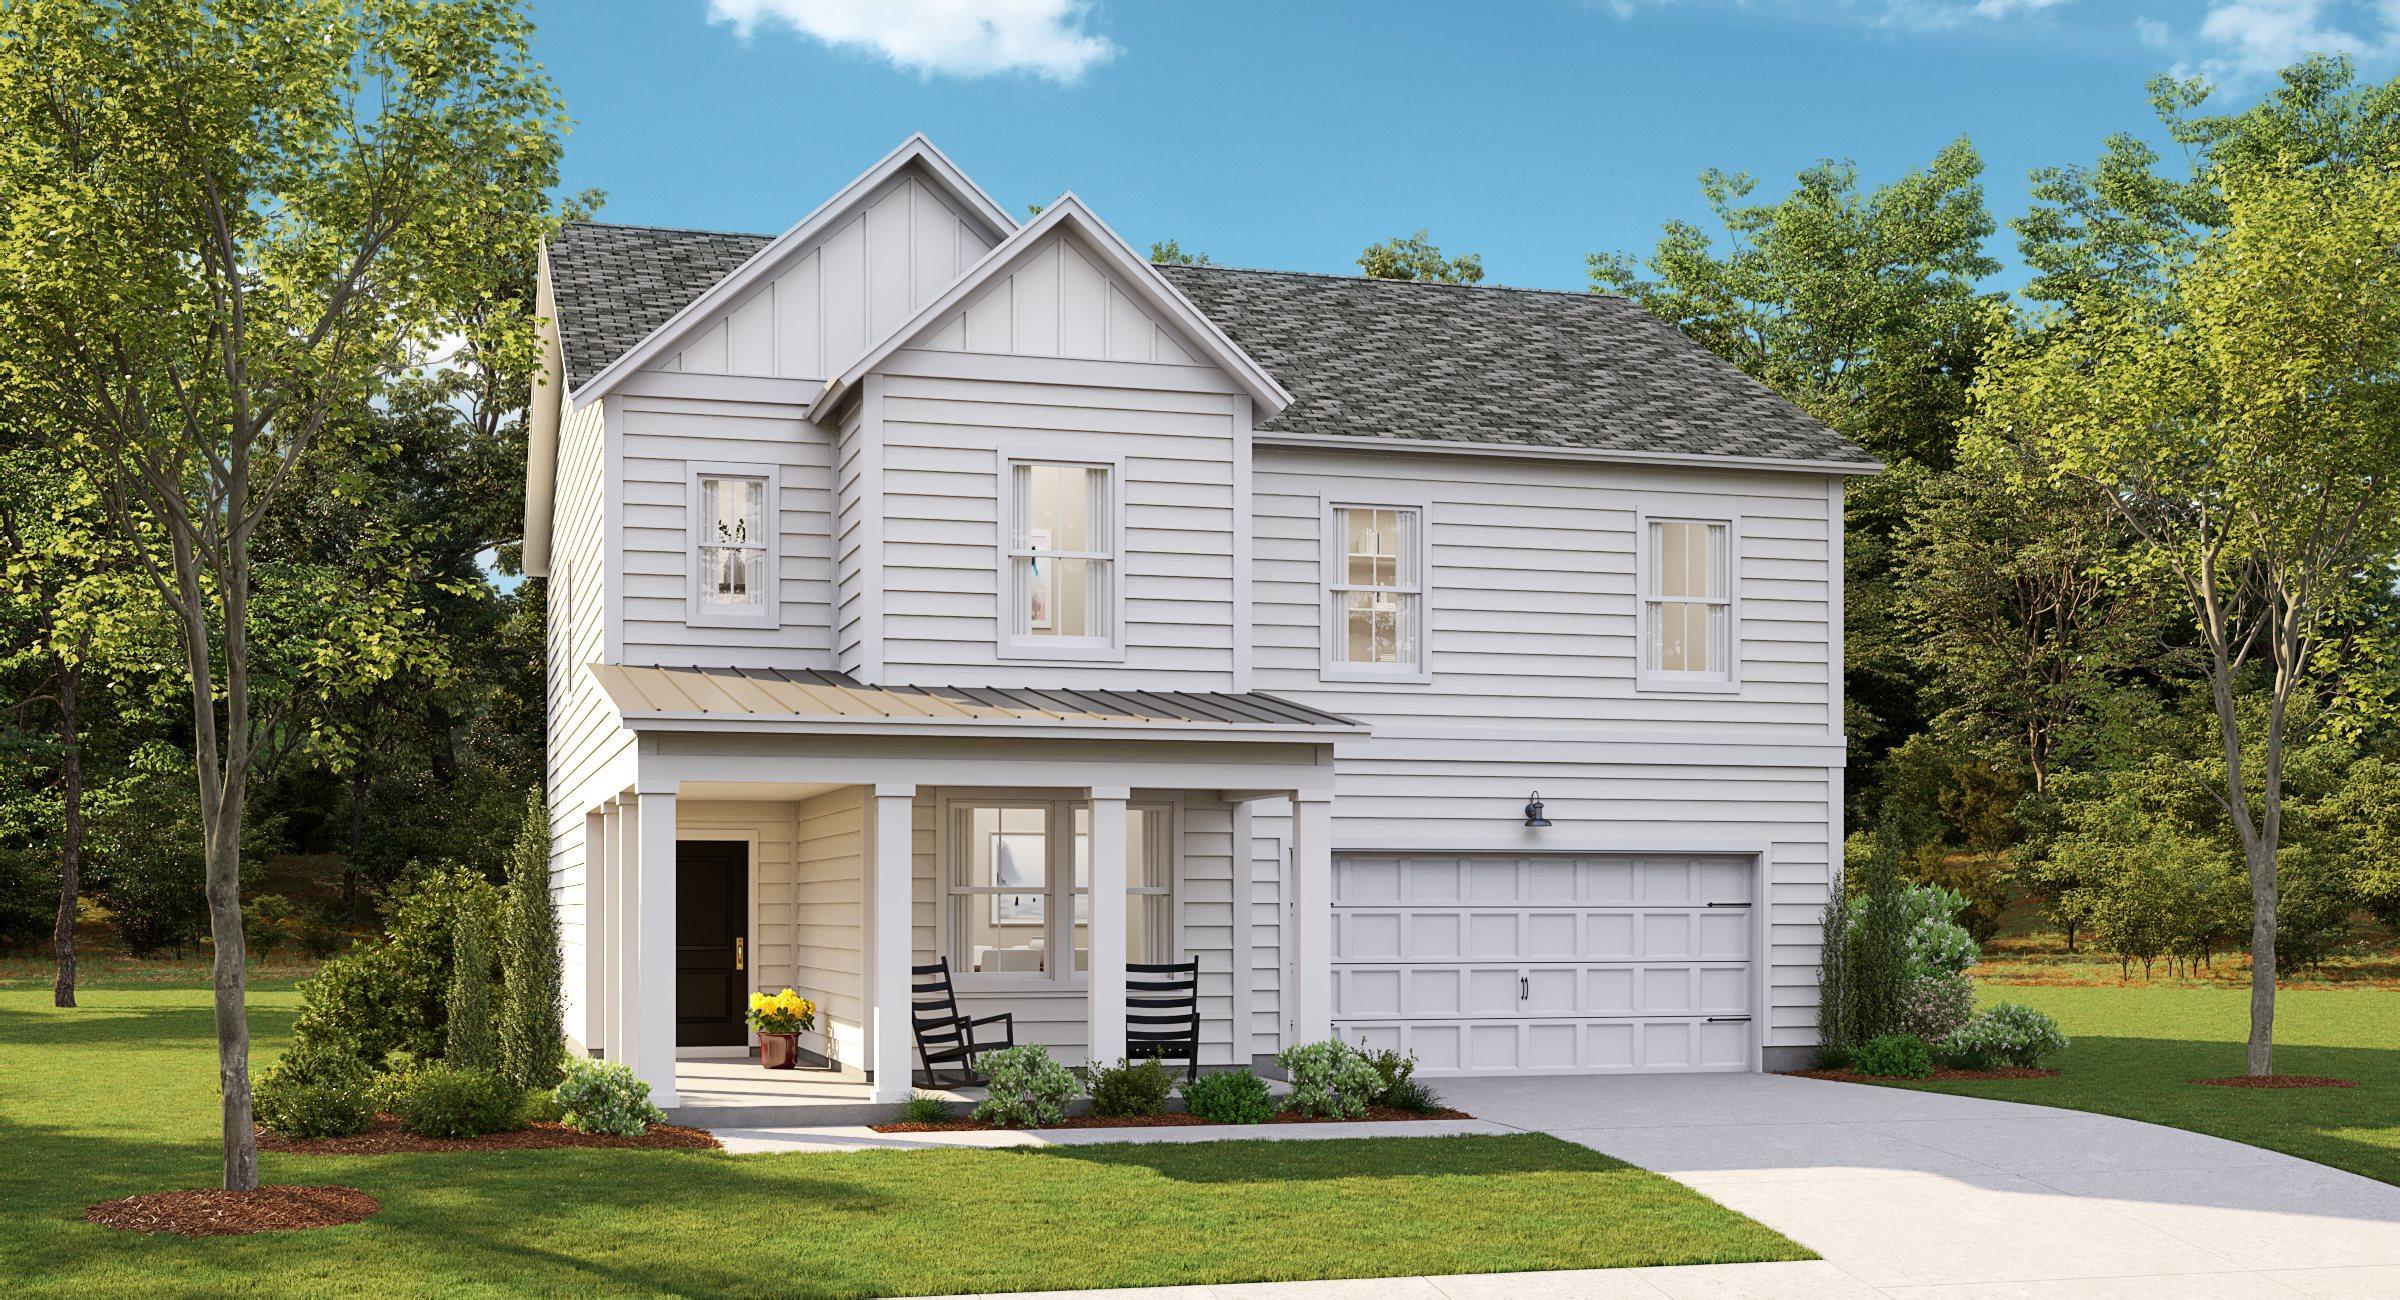 405 West Respite Lane Summerville, SC 29483